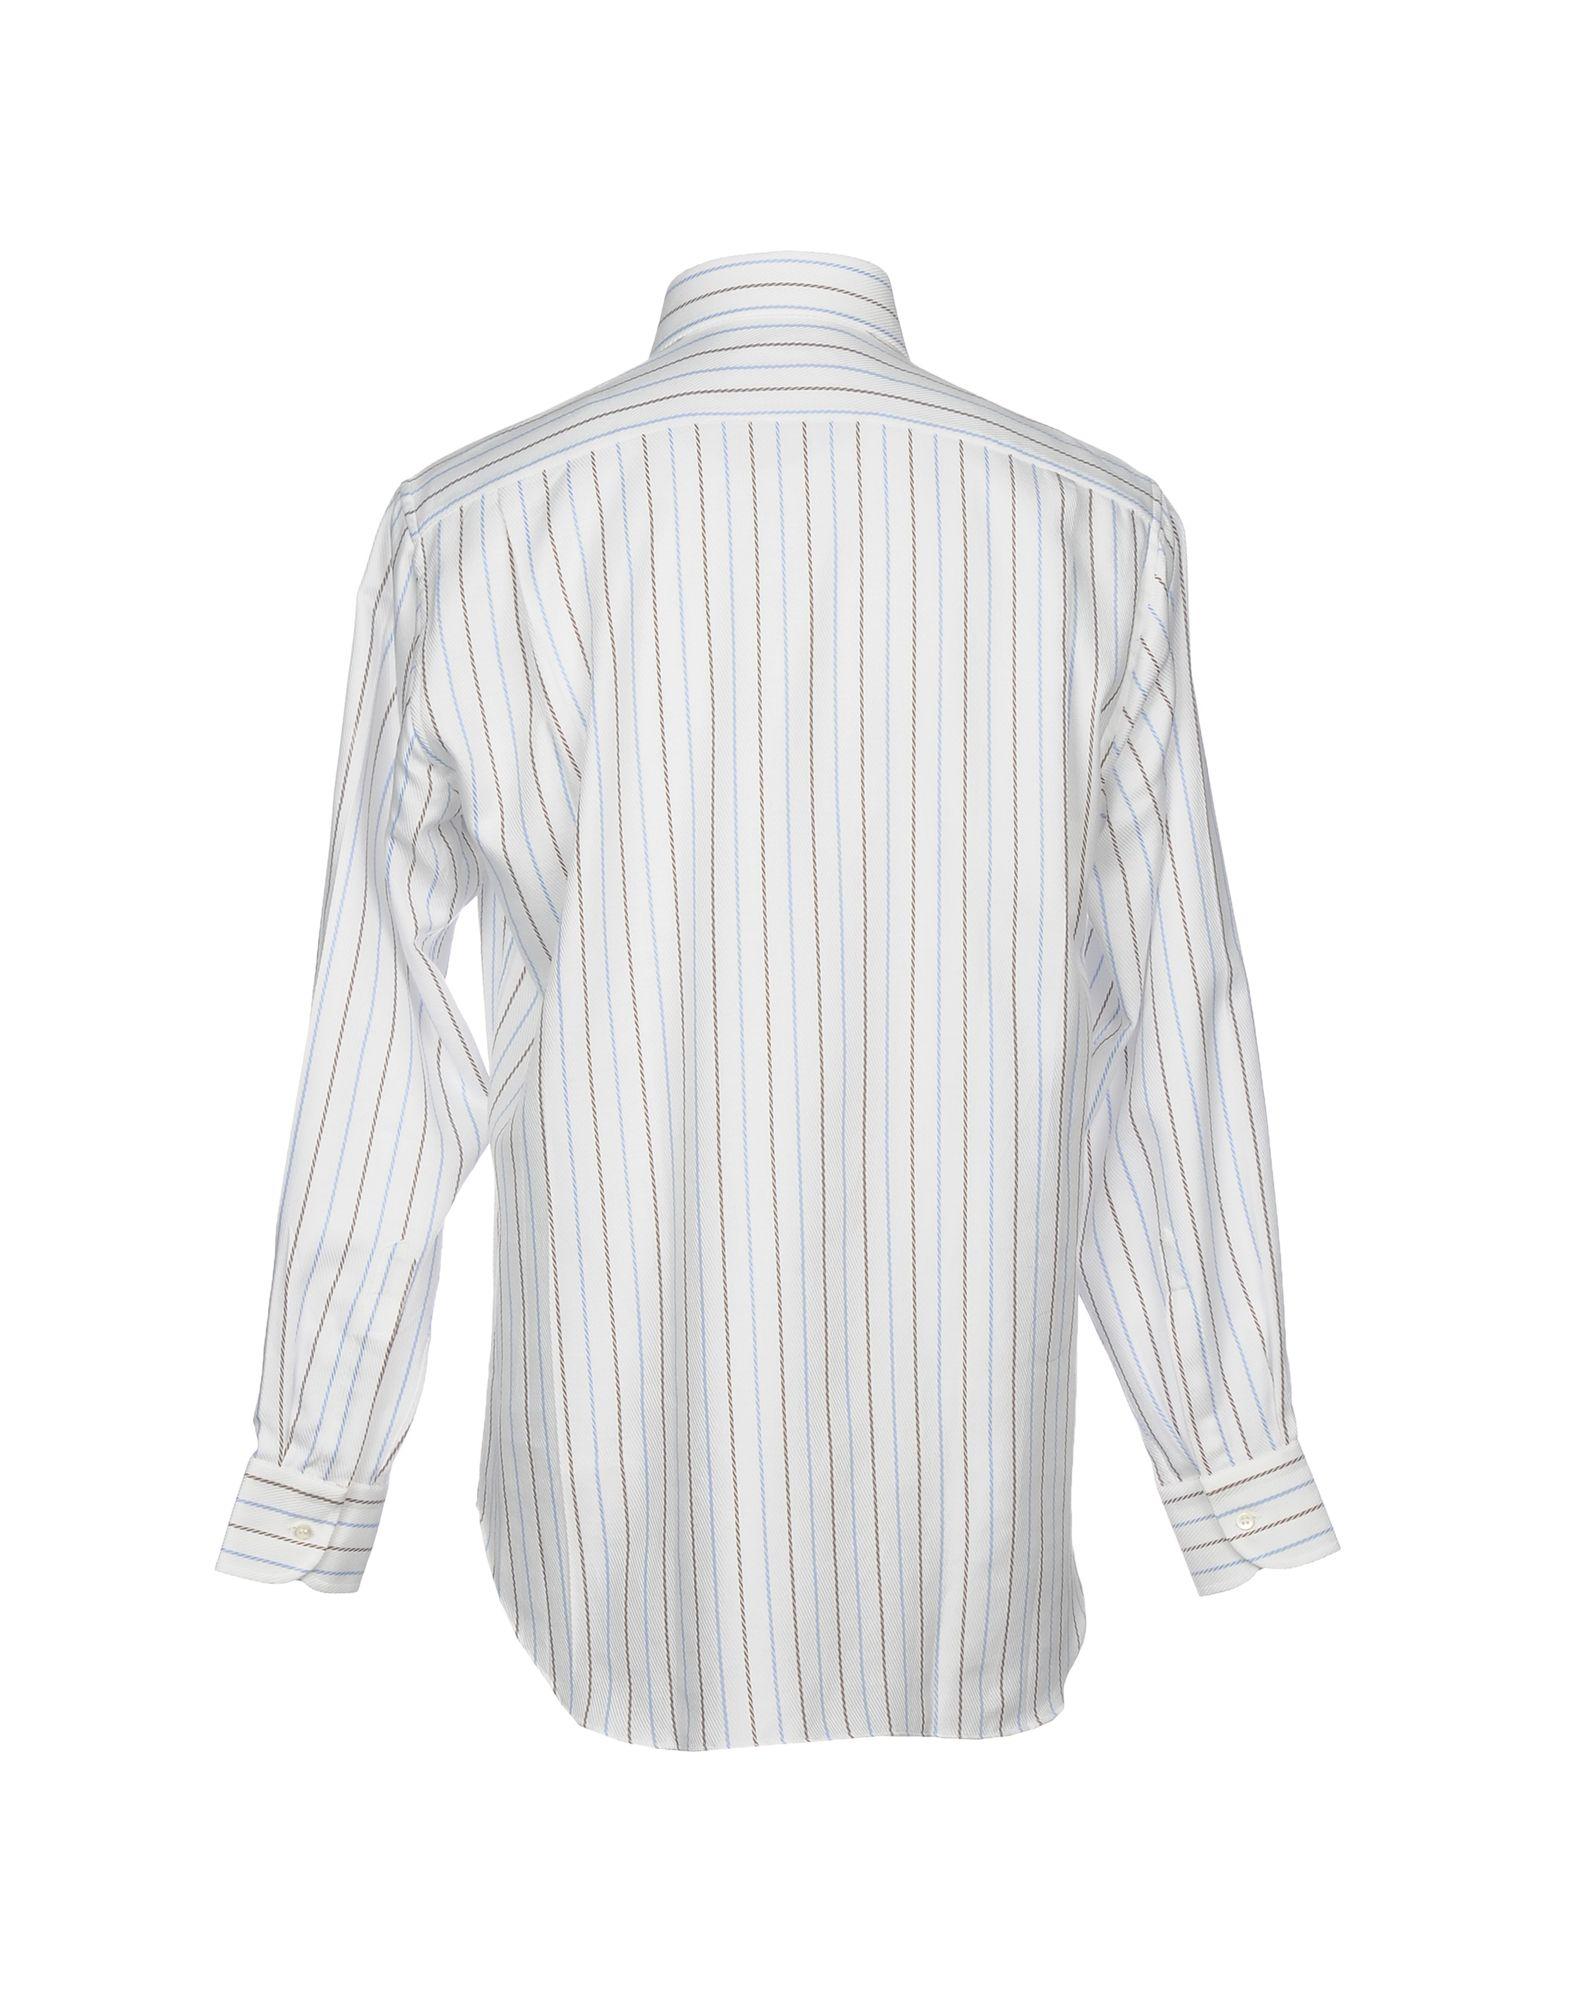 Camicia A Righe Gianmarco Bonaga Bonaga Bonaga Uomo - 38734797UH b14a22